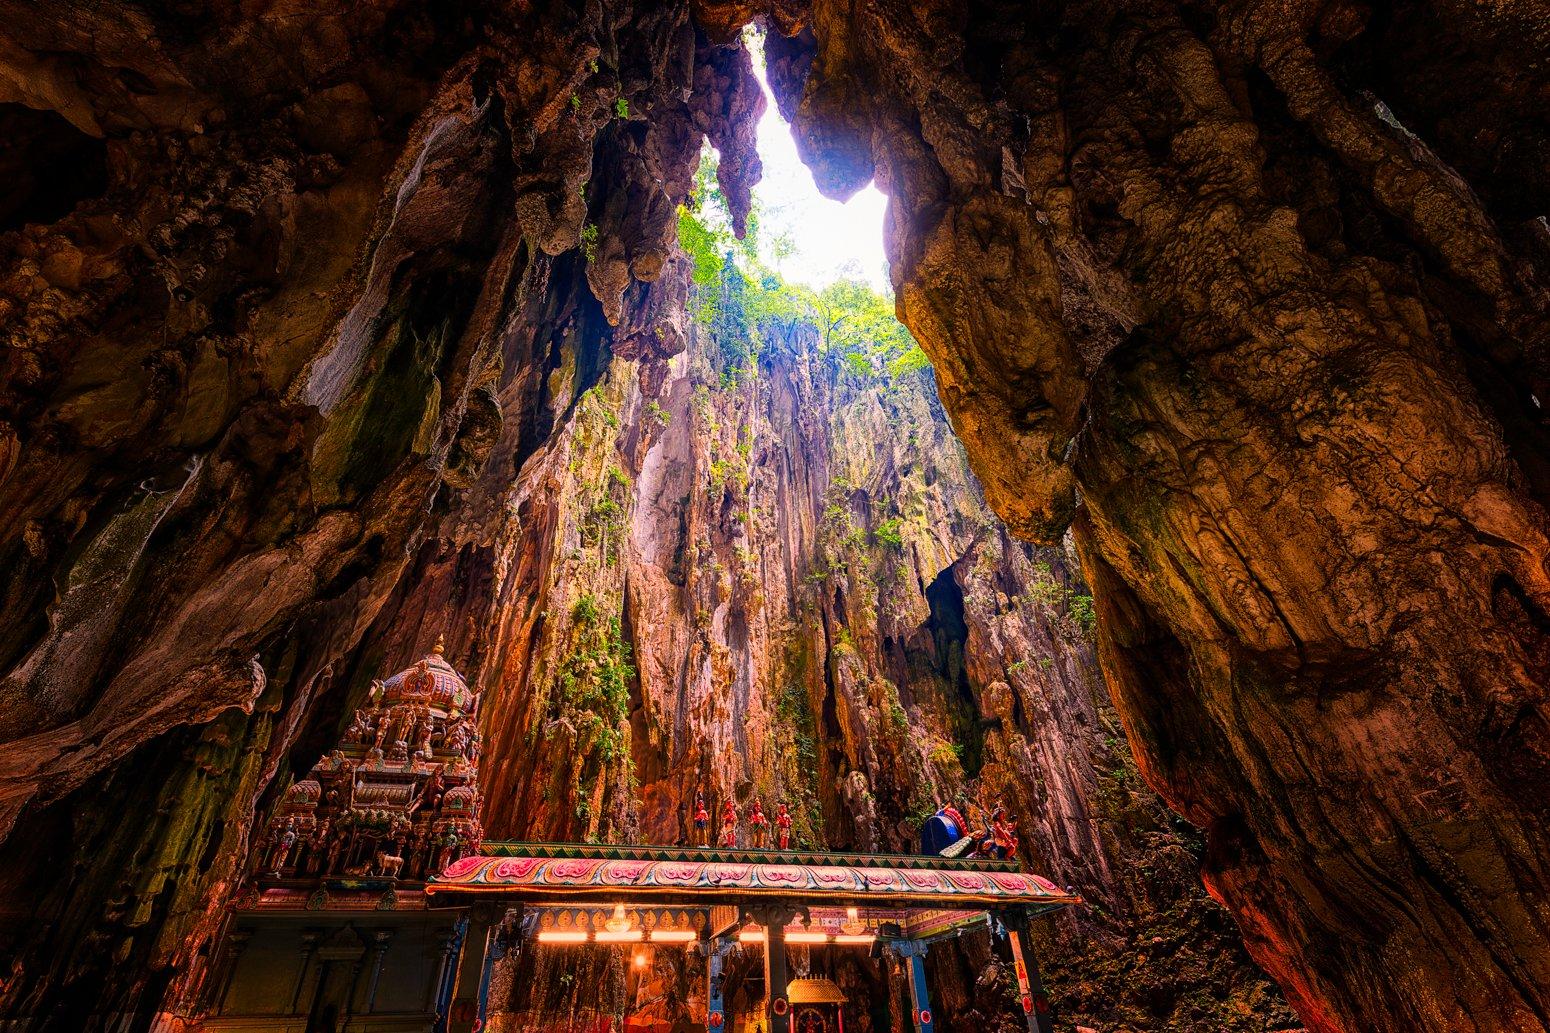 Batu Cave nahe Kuala Lumpur, Malaysia mit Hindu-Tempel in der Morgensonne.